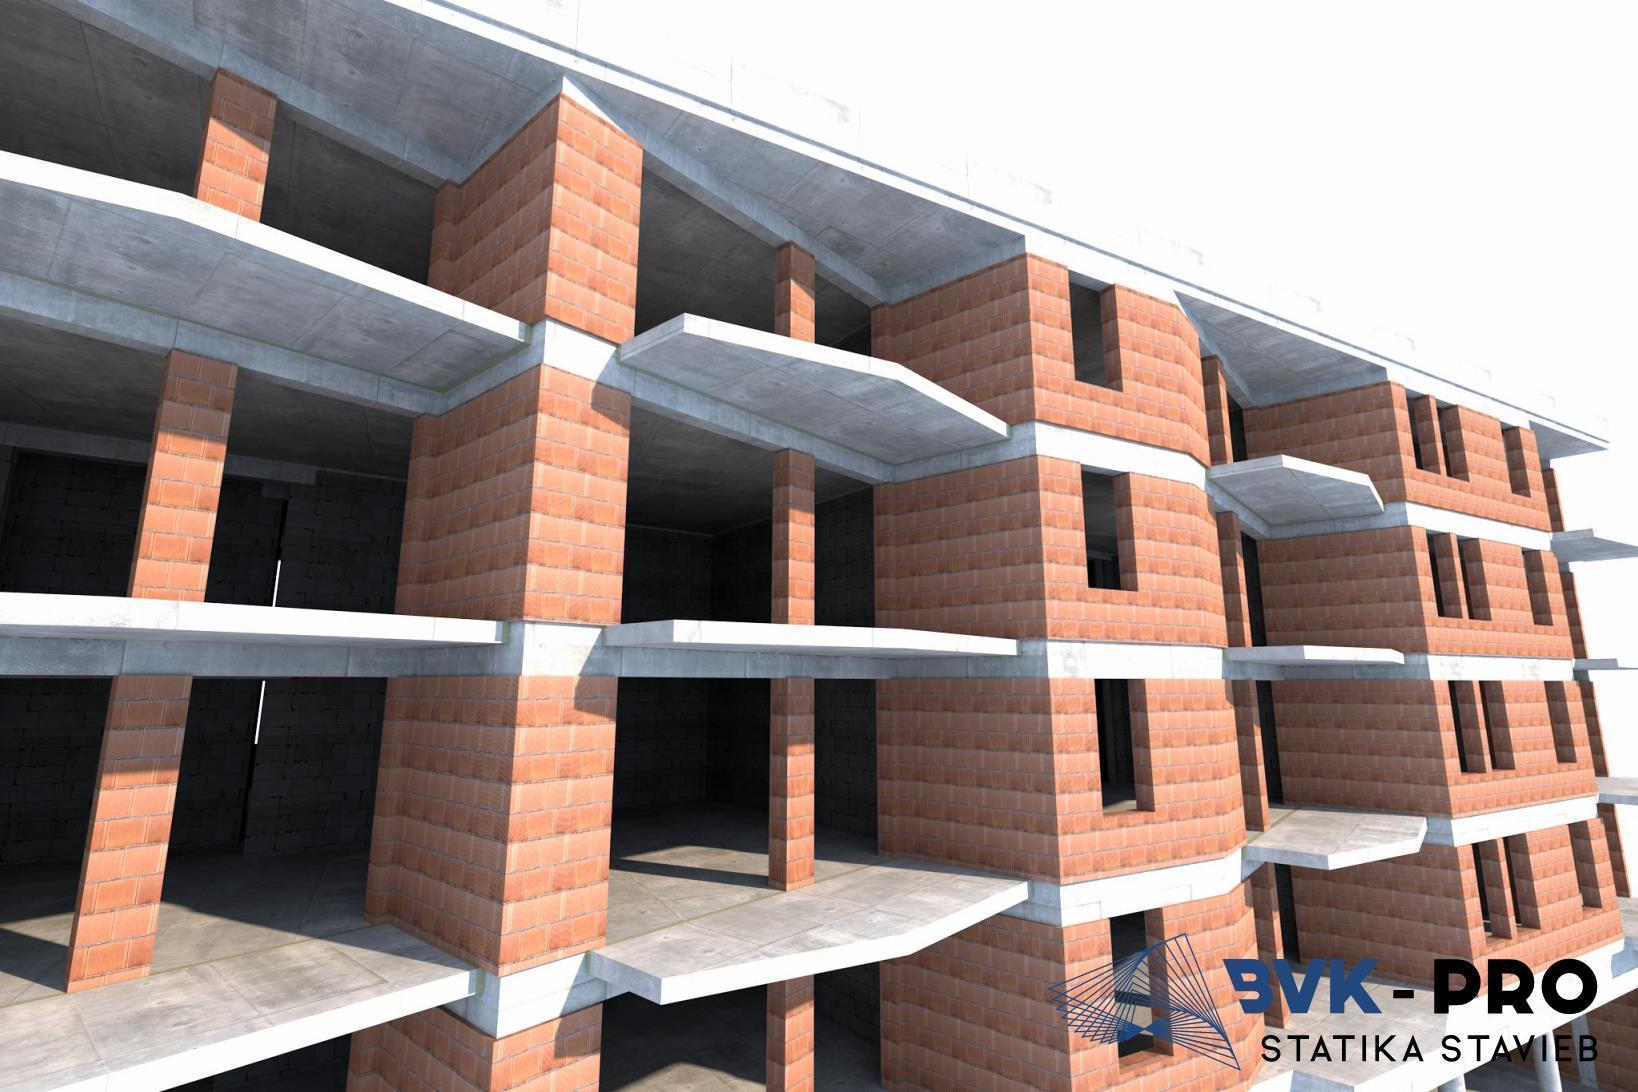 Gradus Residence Bvk Pro S R O  Page 008